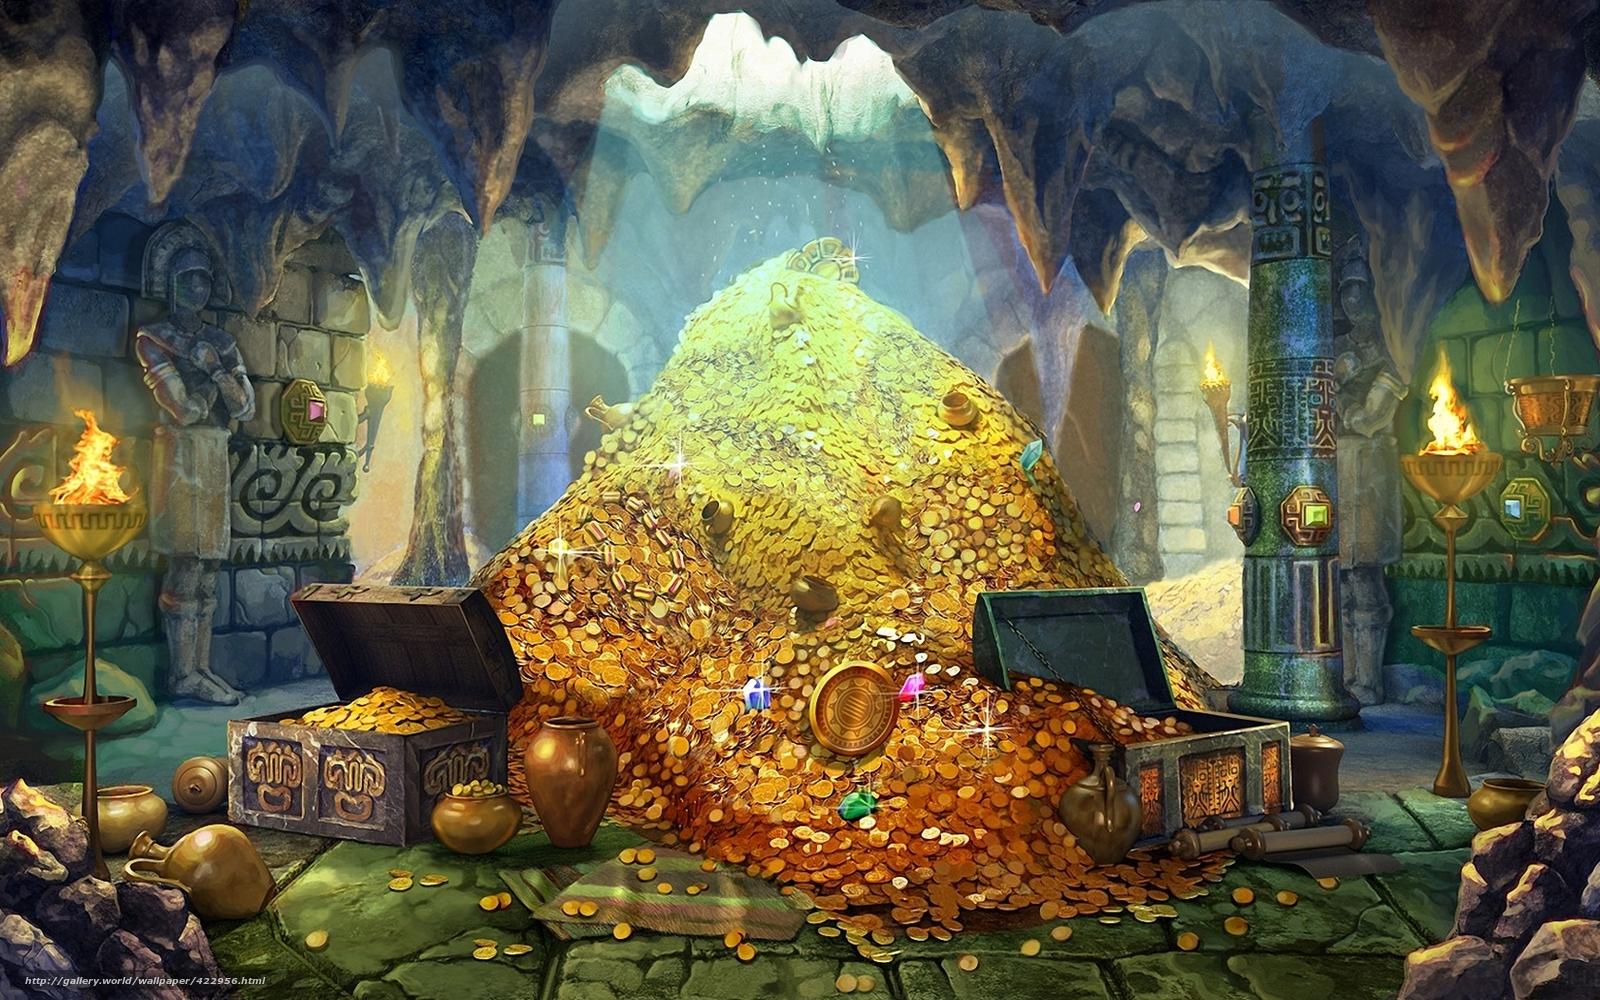 Aladino e la lampada meravigliosa 422956_art_sokrovishha_zoloto_ukrasheniya_monety_sunduki__1680x1050_www.Gde-Fon.com